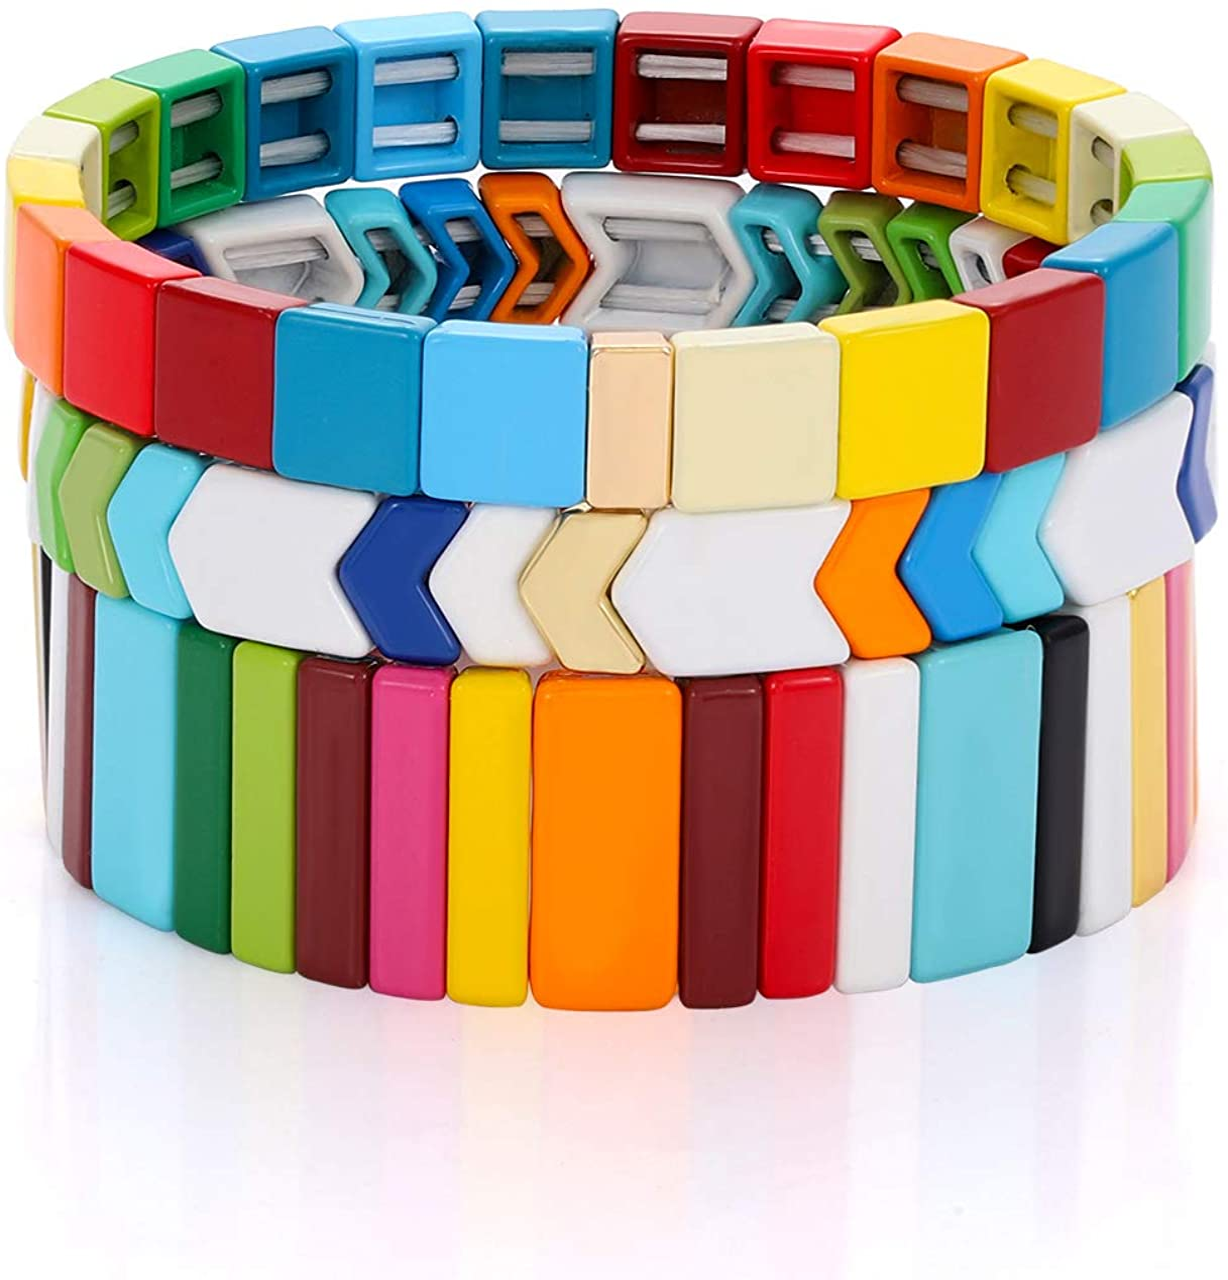 LENOOCLE Rainbow Enamel Tile Bracelet Colorful Enameled Beaded Stretch Bracelet Stackable Color-Block Strand Bracelet Set for Women Men